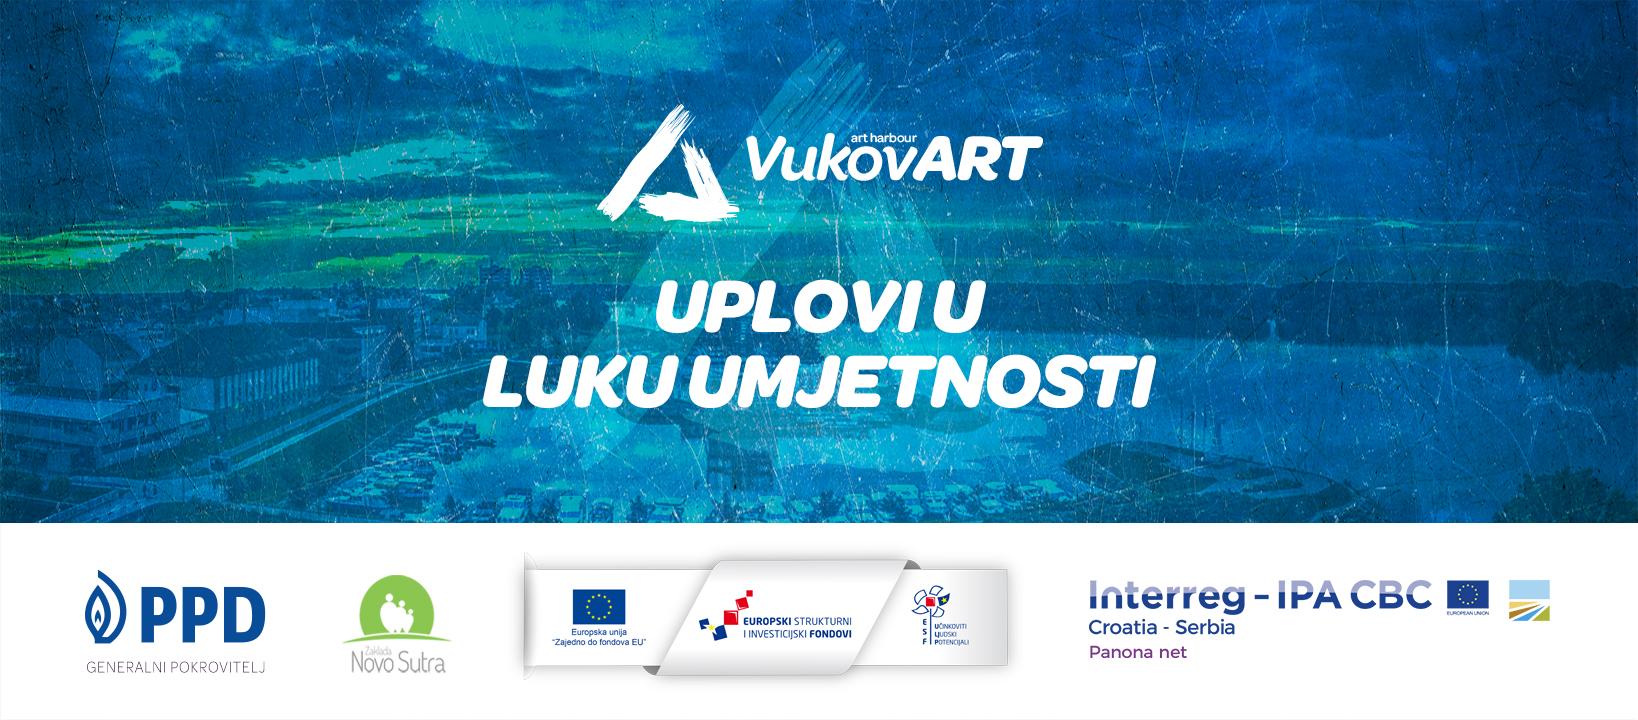 VukovART – Street art festival u Vukovar